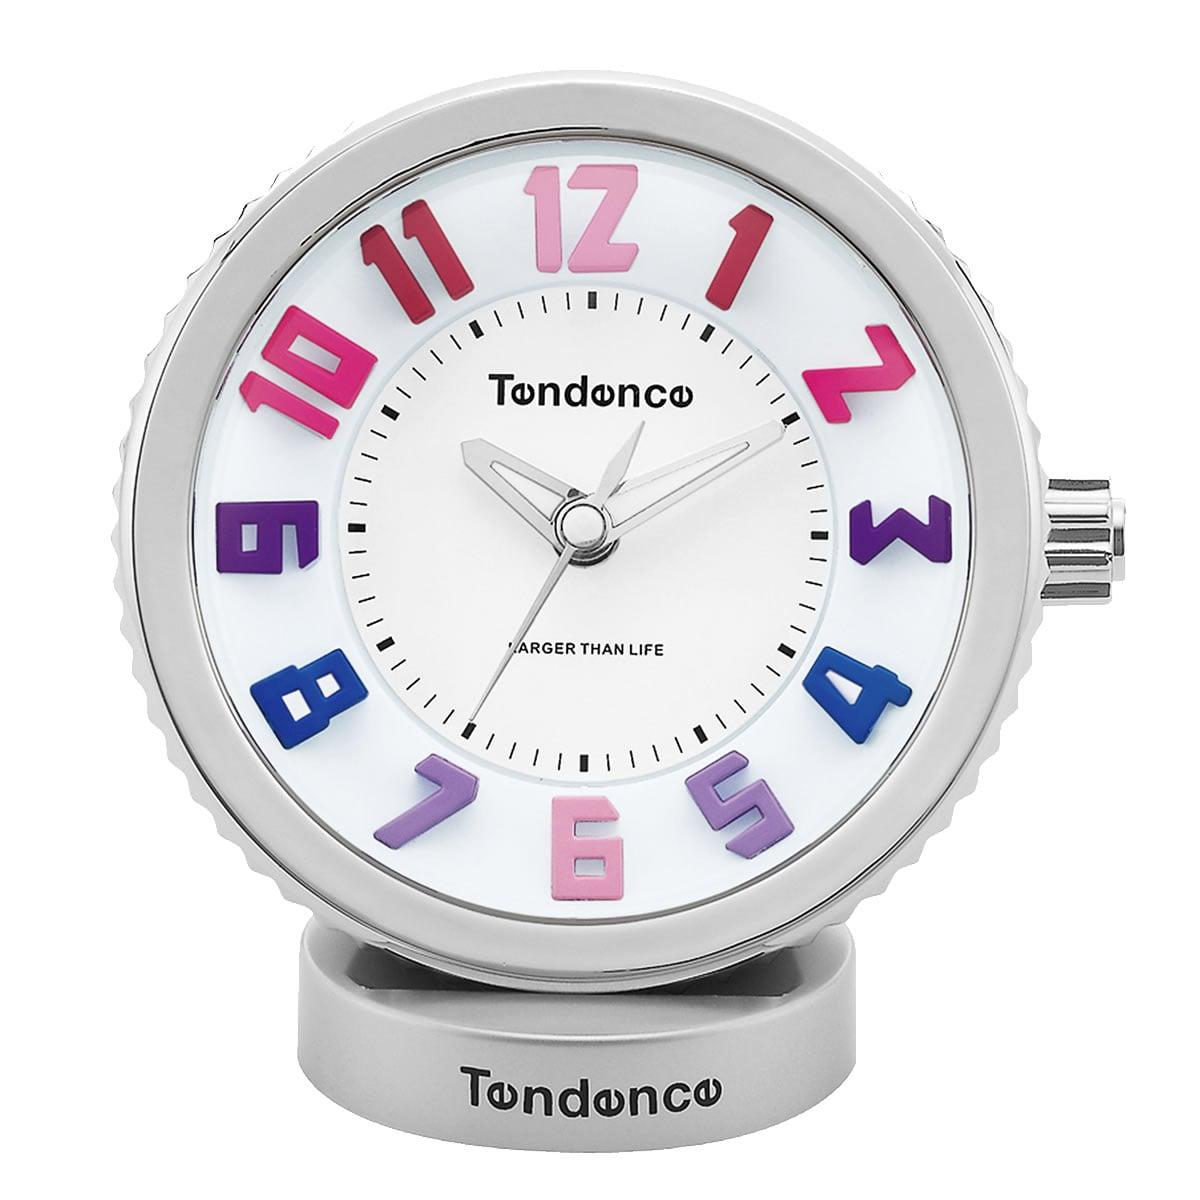 Tendence(テンデンス) 置き時計 TABLE Clock(テーブルクロック) TP429916